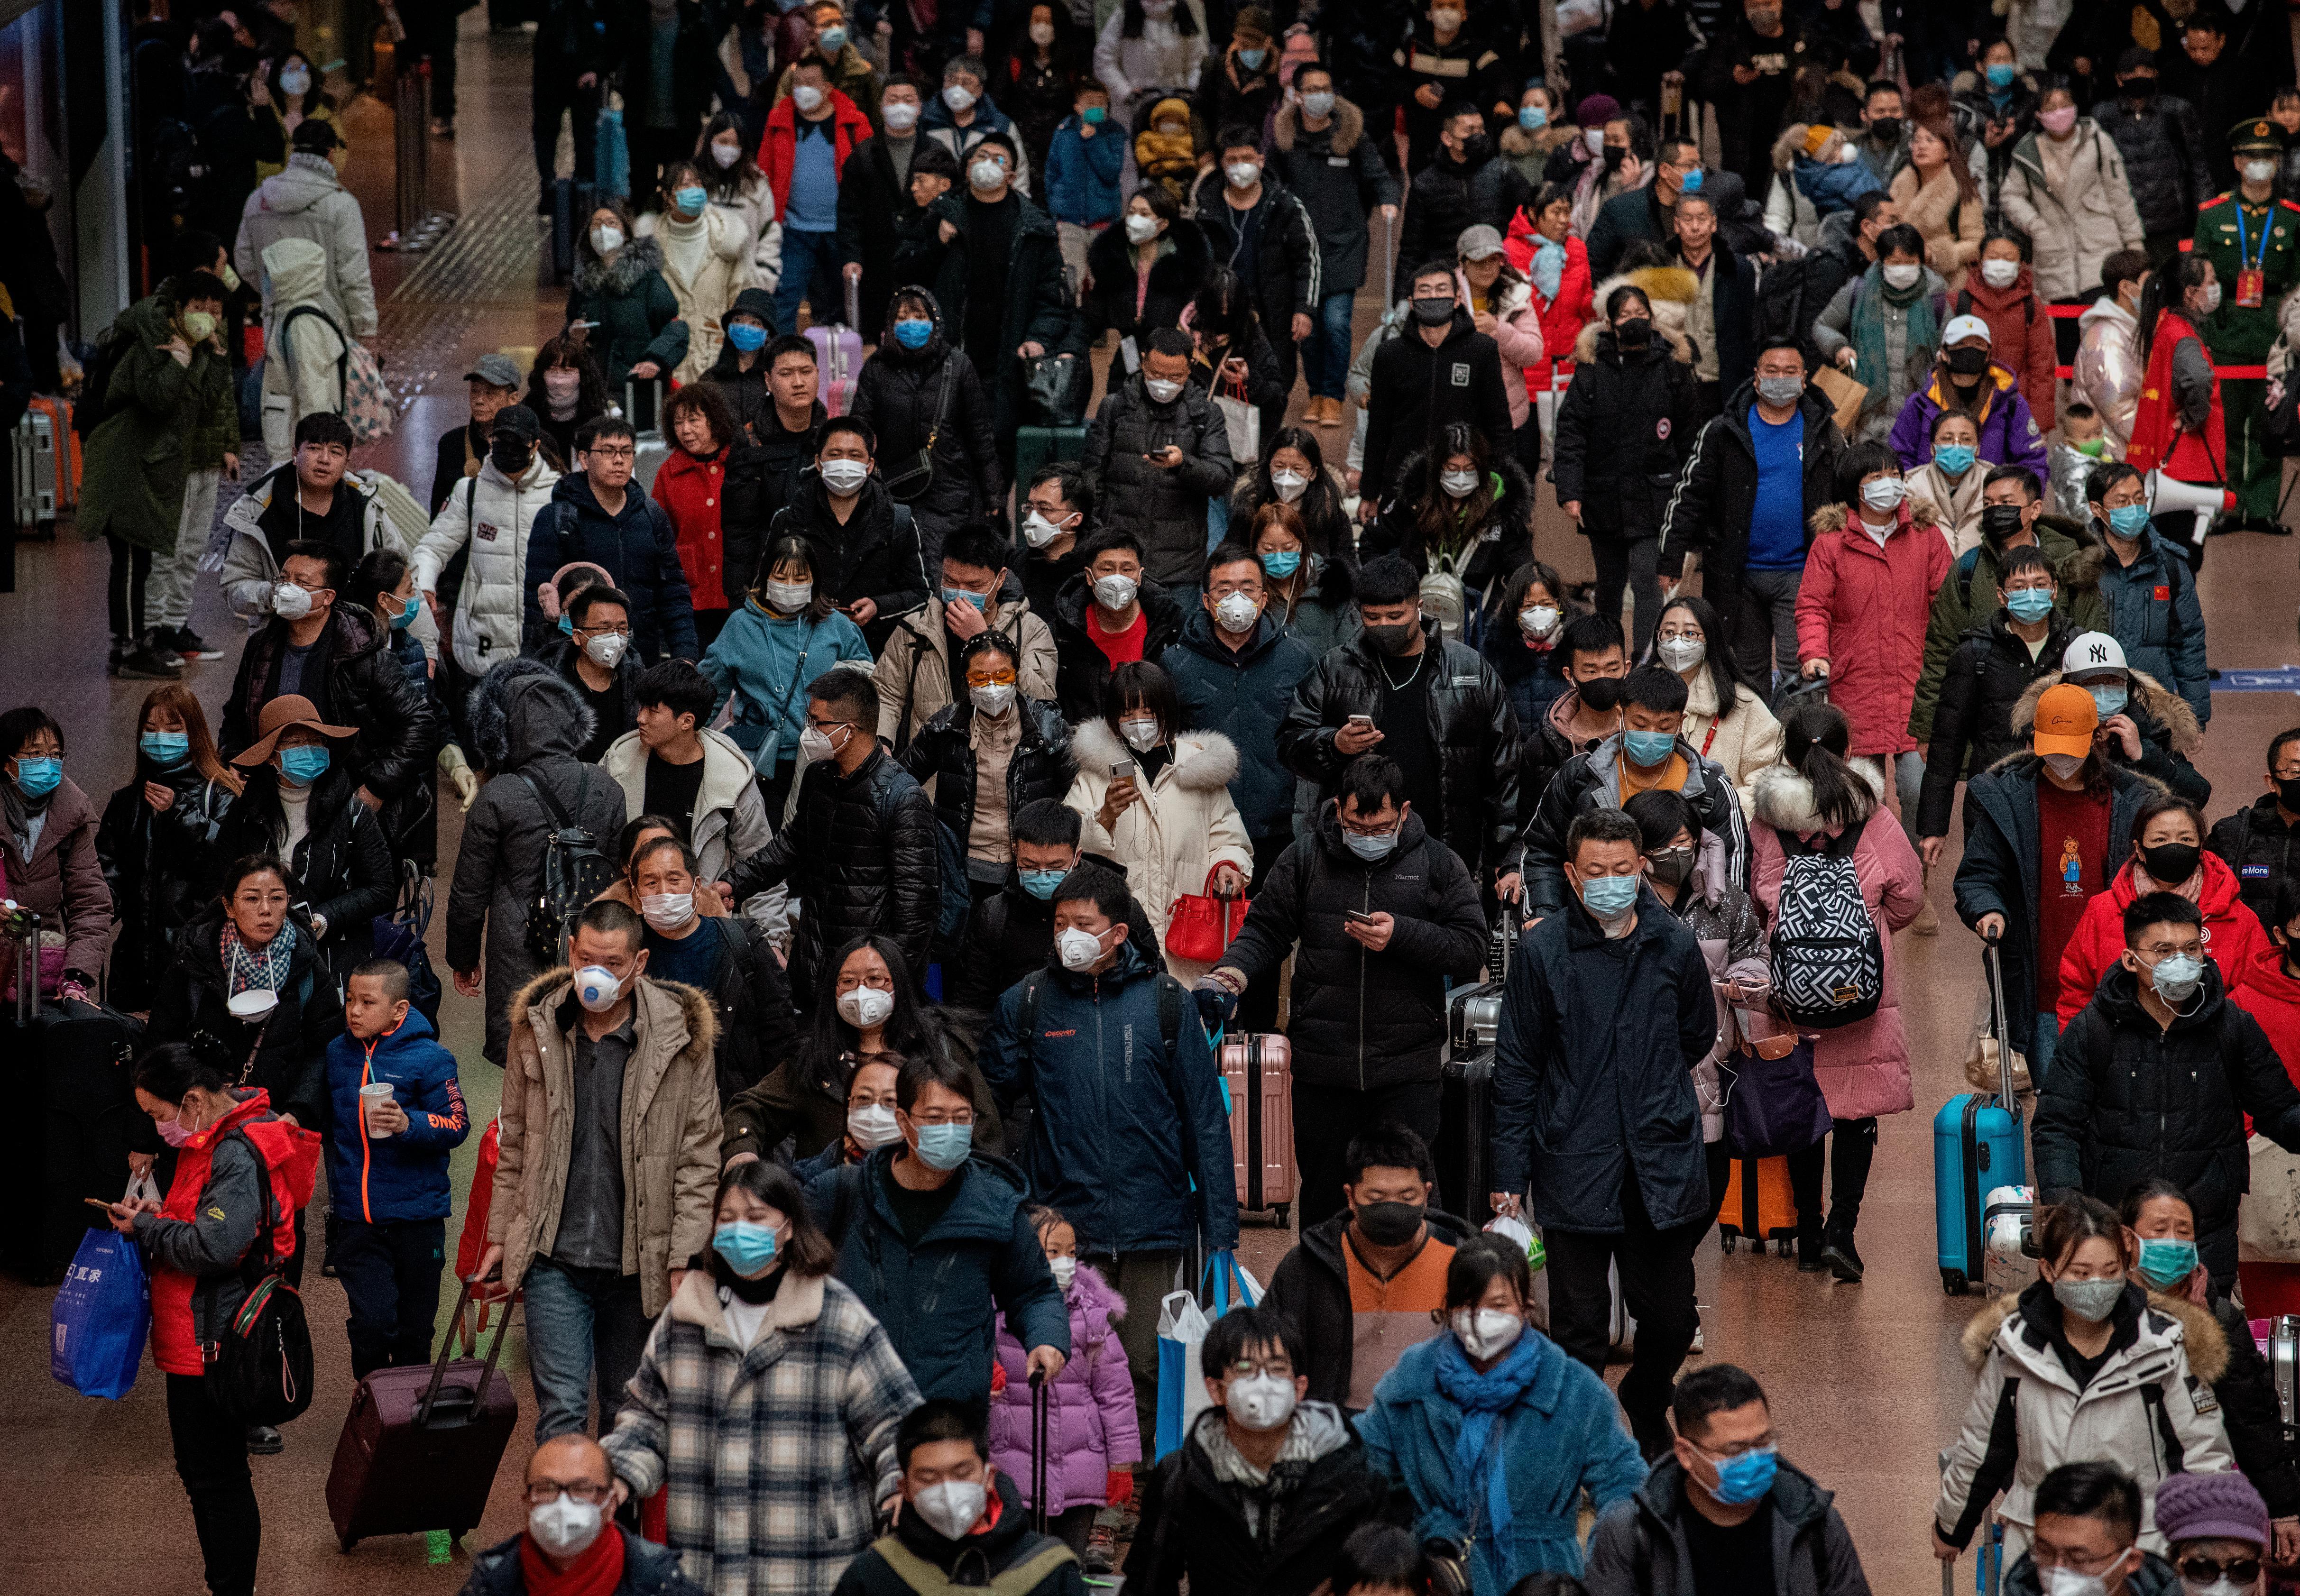 death toll in china from coronavirus